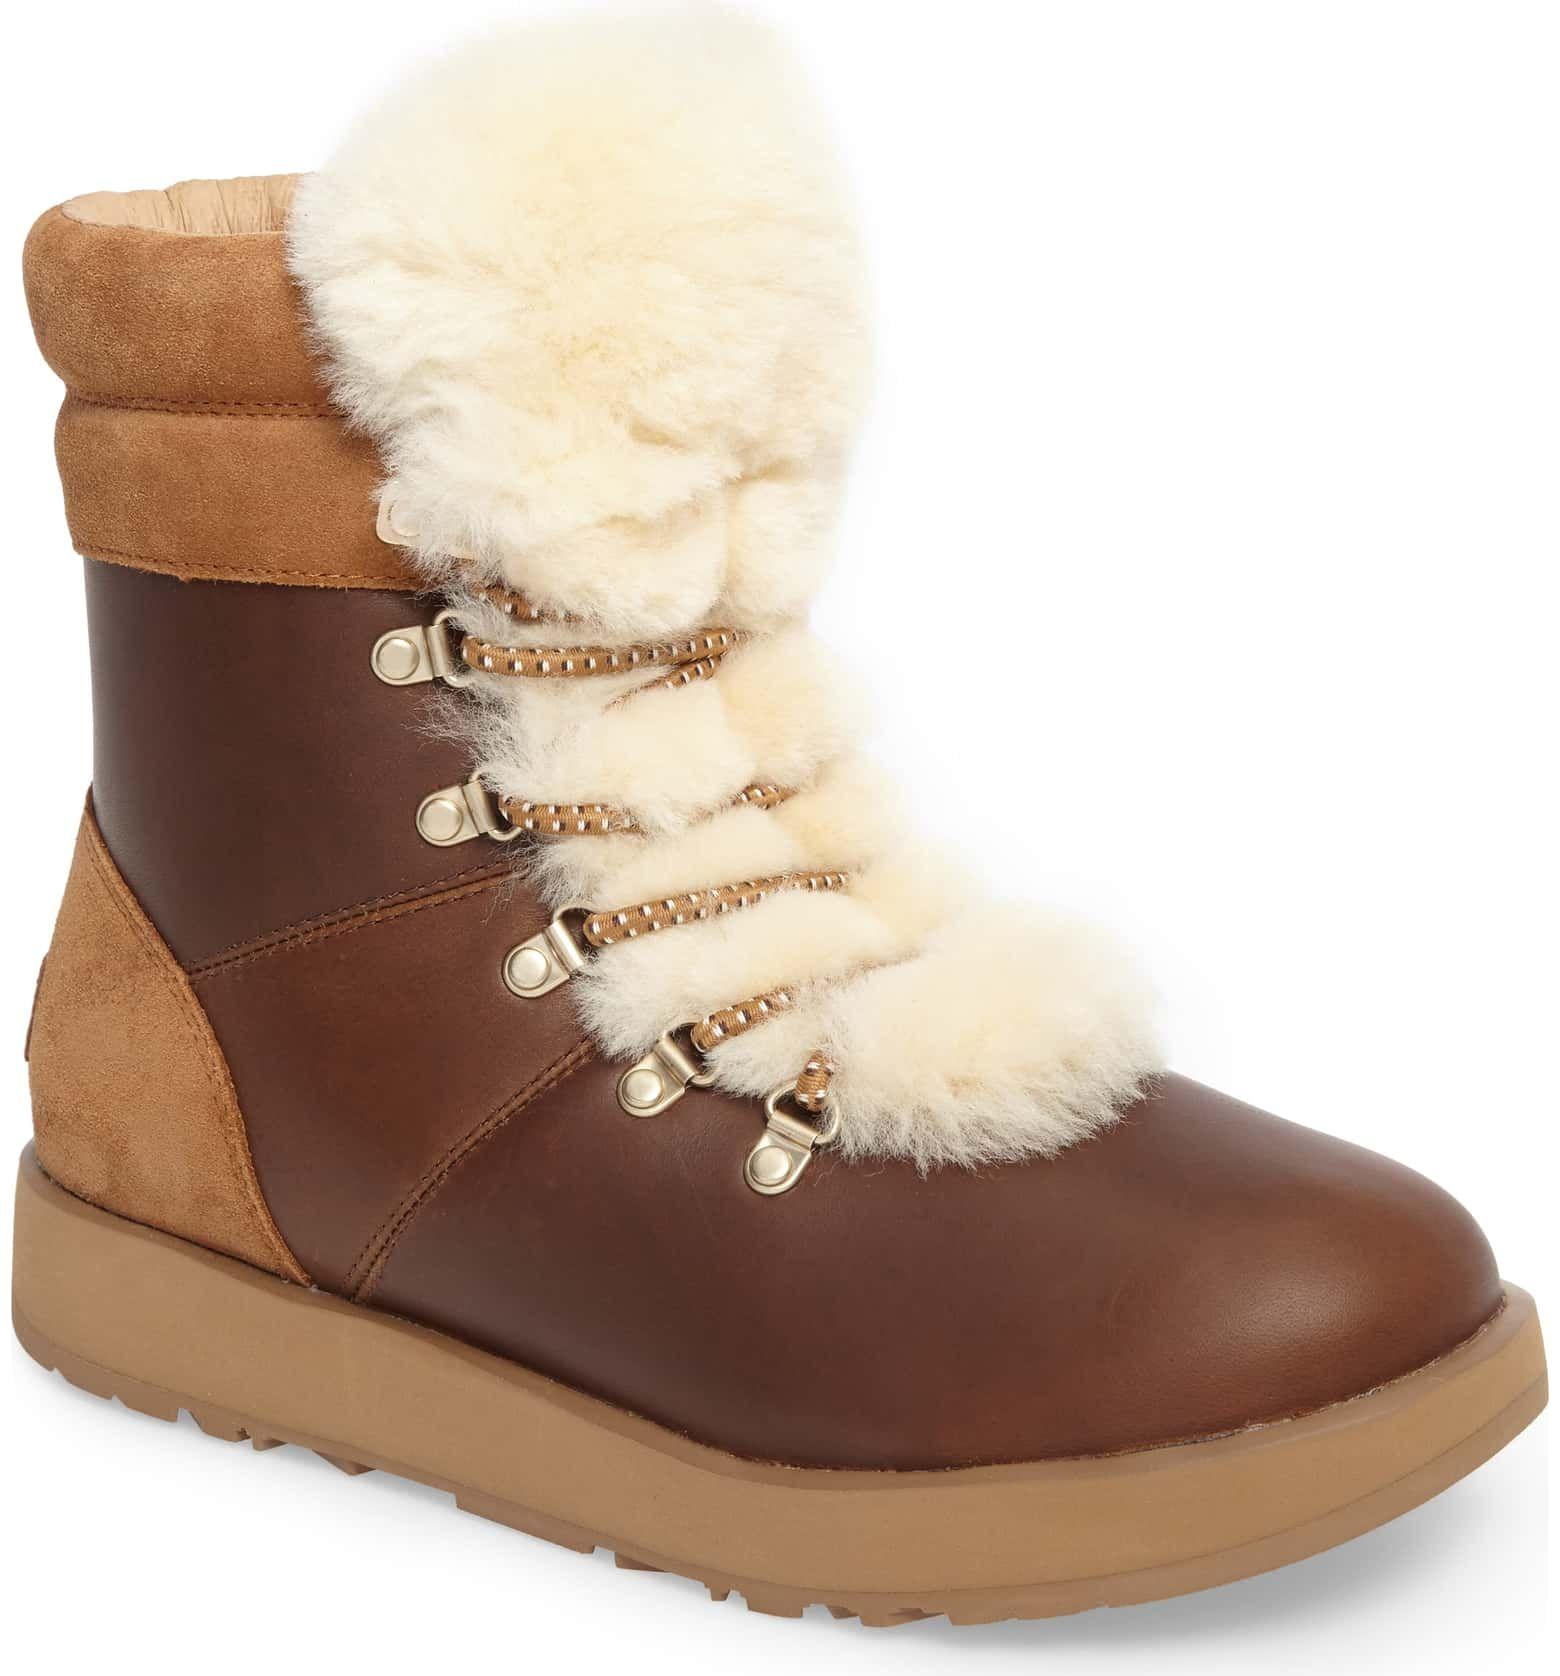 66b94037ea3 Viki Waterproof Boot, Main, color, CHESTNUT LEATHER | wish list ...